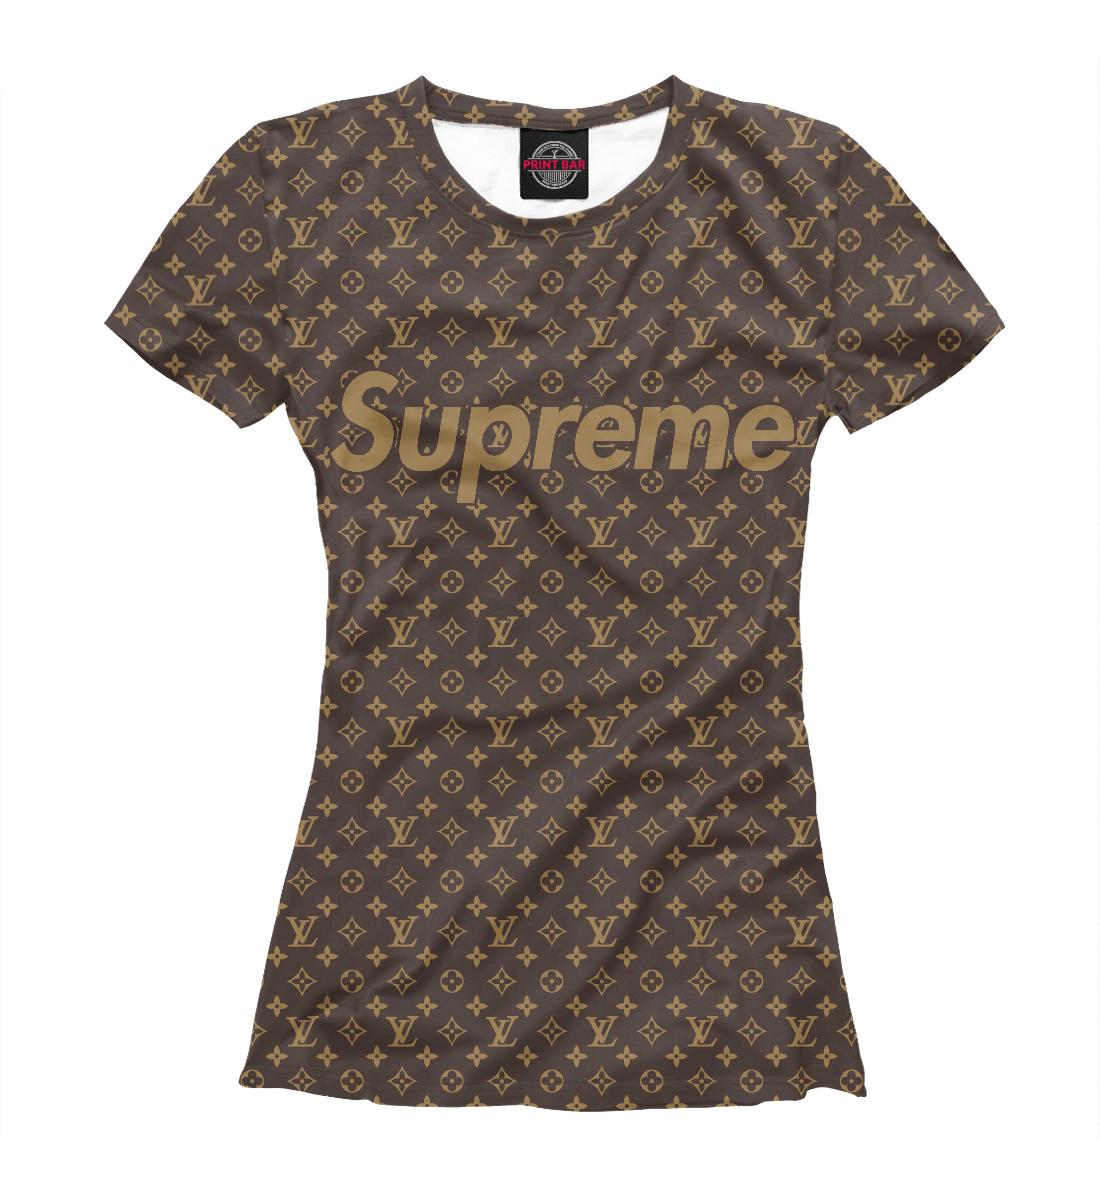 Купить Supreme Louis Vuitton, Printbar, Футболки, SPR-676676-fut-1